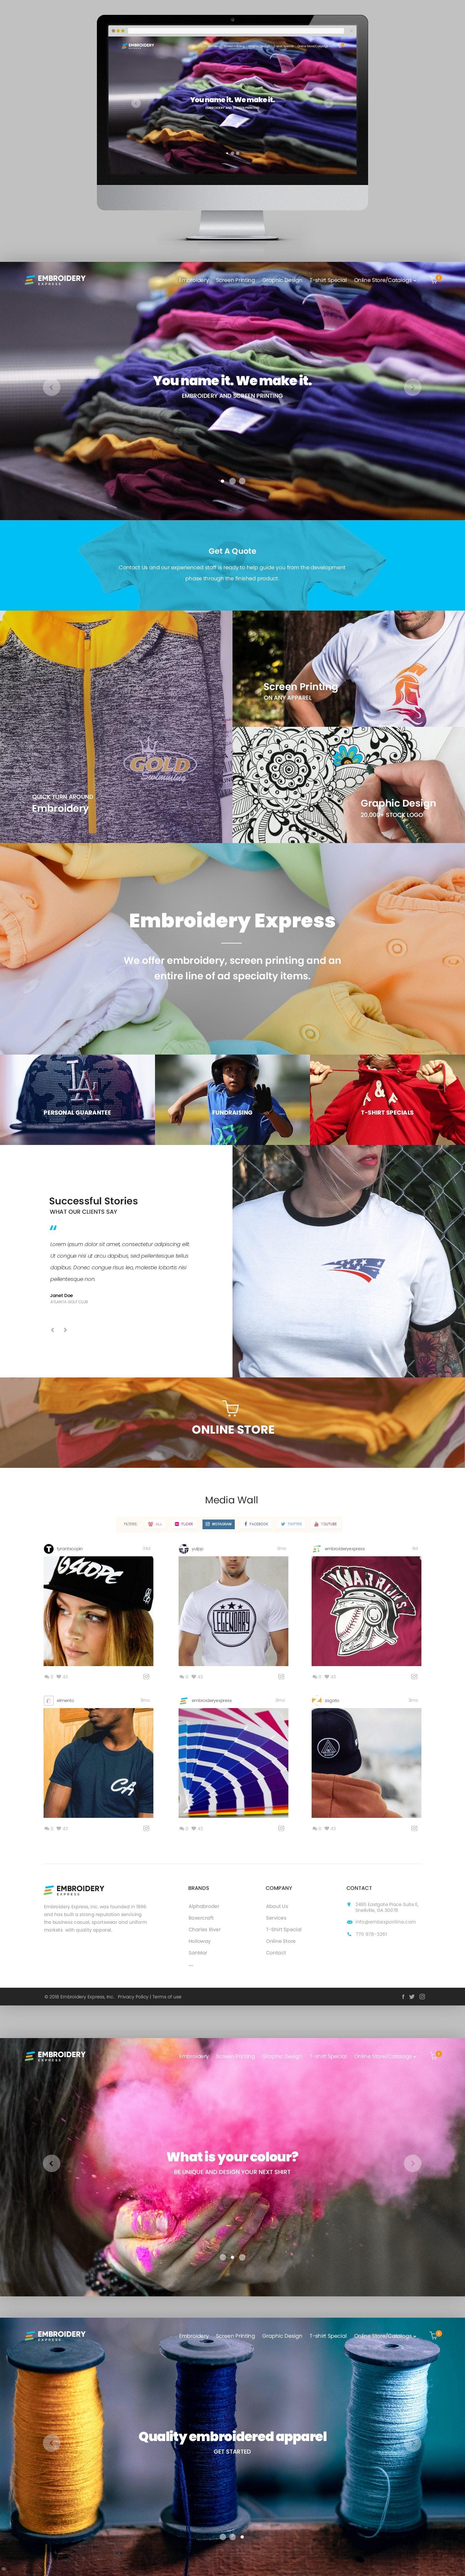 Clothing website design